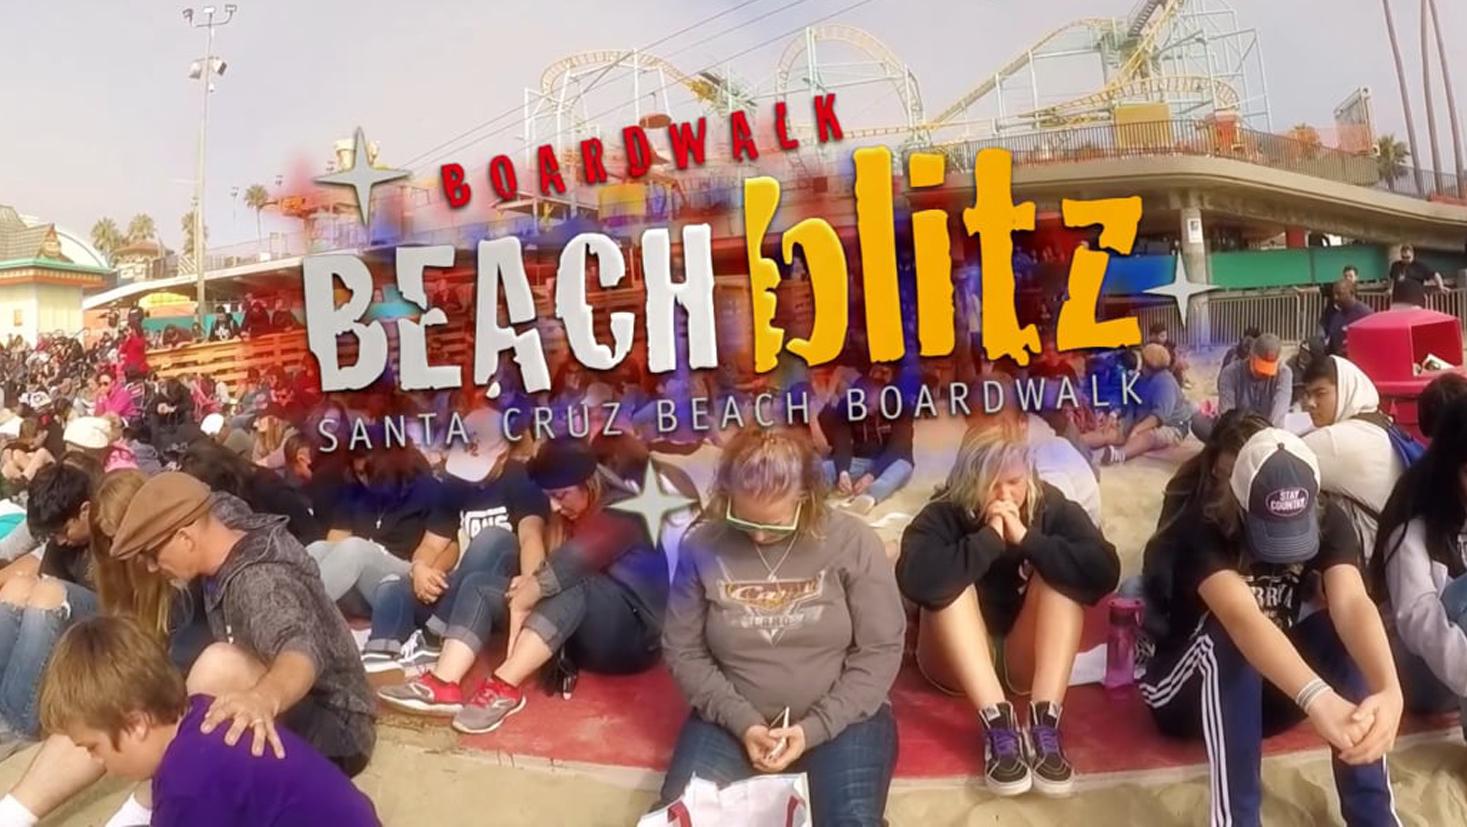 BoardwalkBeachBlitz_Event.jpg